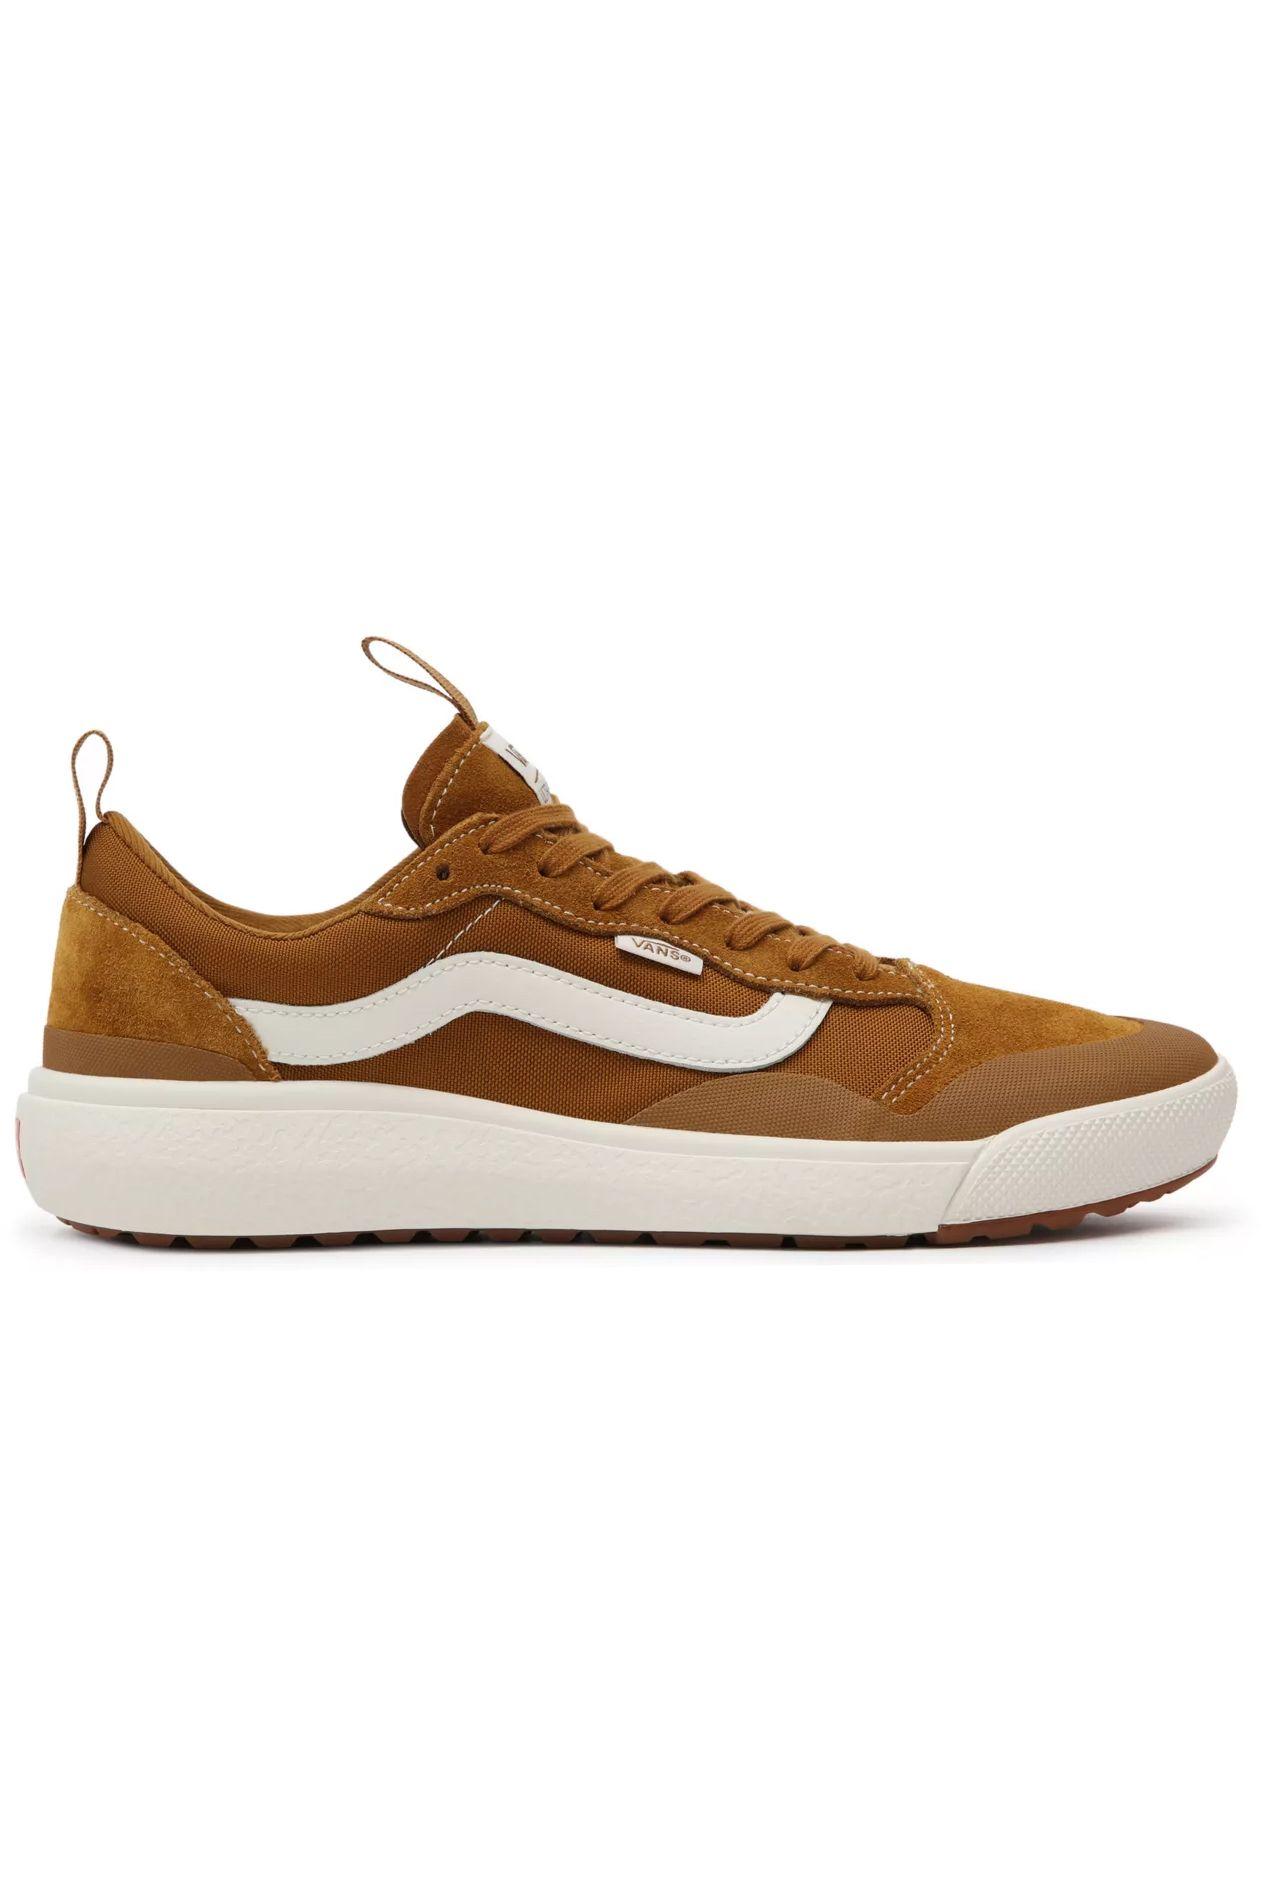 Vans Shoes UA ULTRARANGE EXO SE Golden Brown/Marshmallow